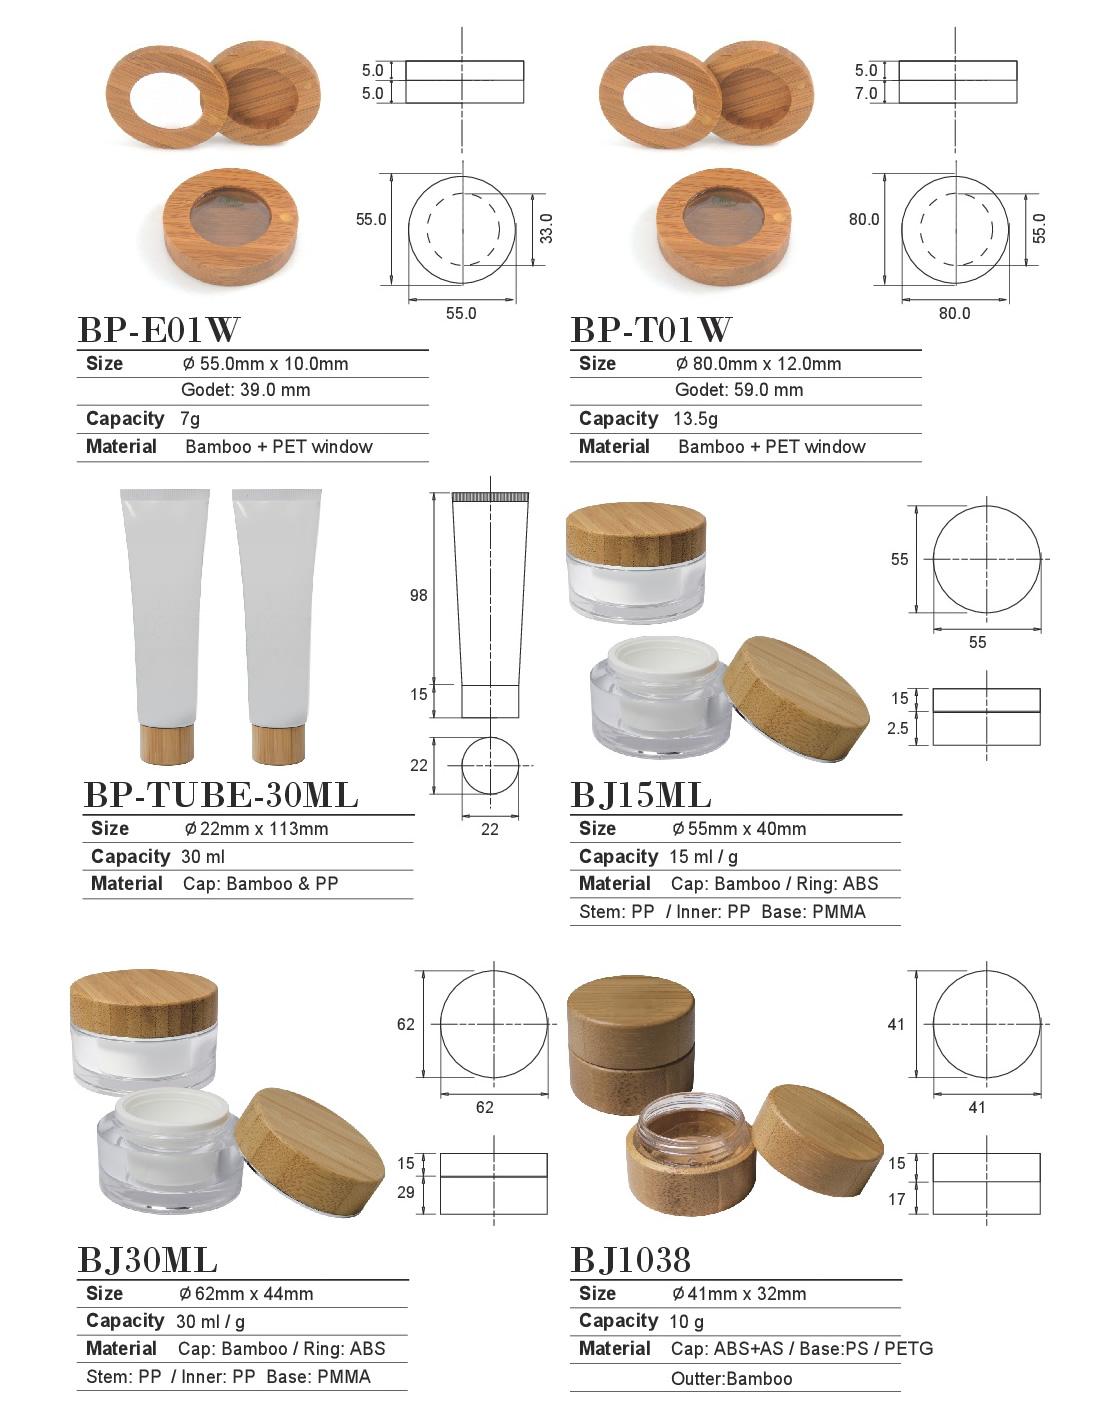 竹容器 竹製 自然 キャップ 容器 化粧品容器